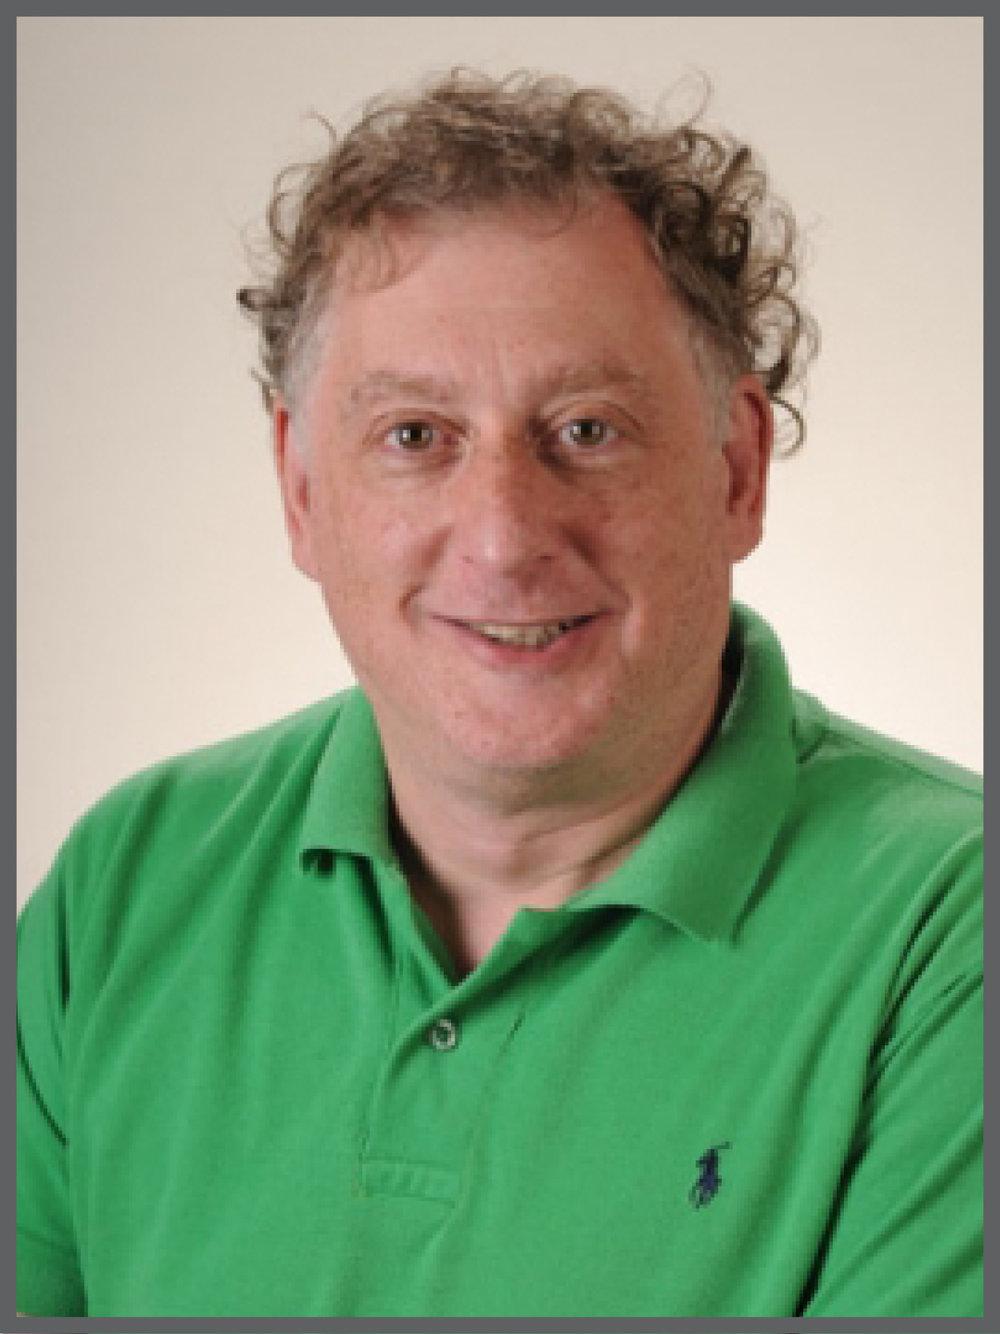 Craig A. Tovey